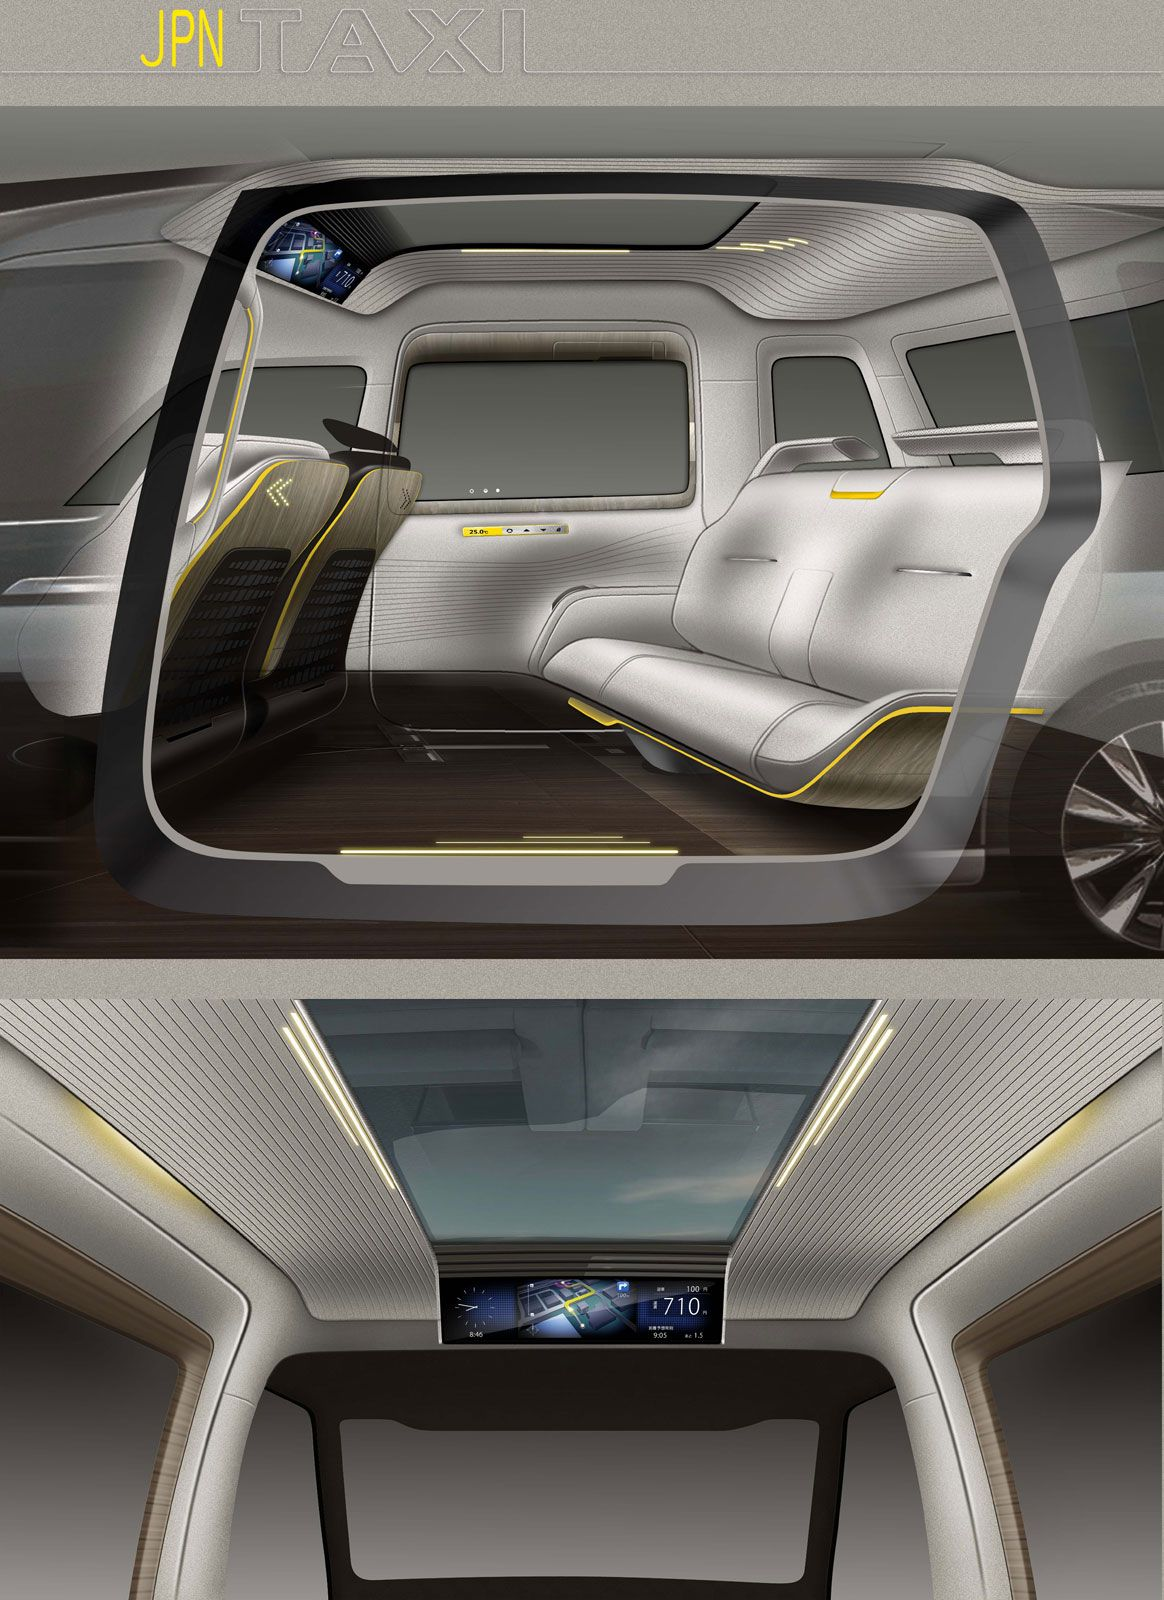 toyota jpn taxi concept interior design sketches car body design mobility pinterest. Black Bedroom Furniture Sets. Home Design Ideas